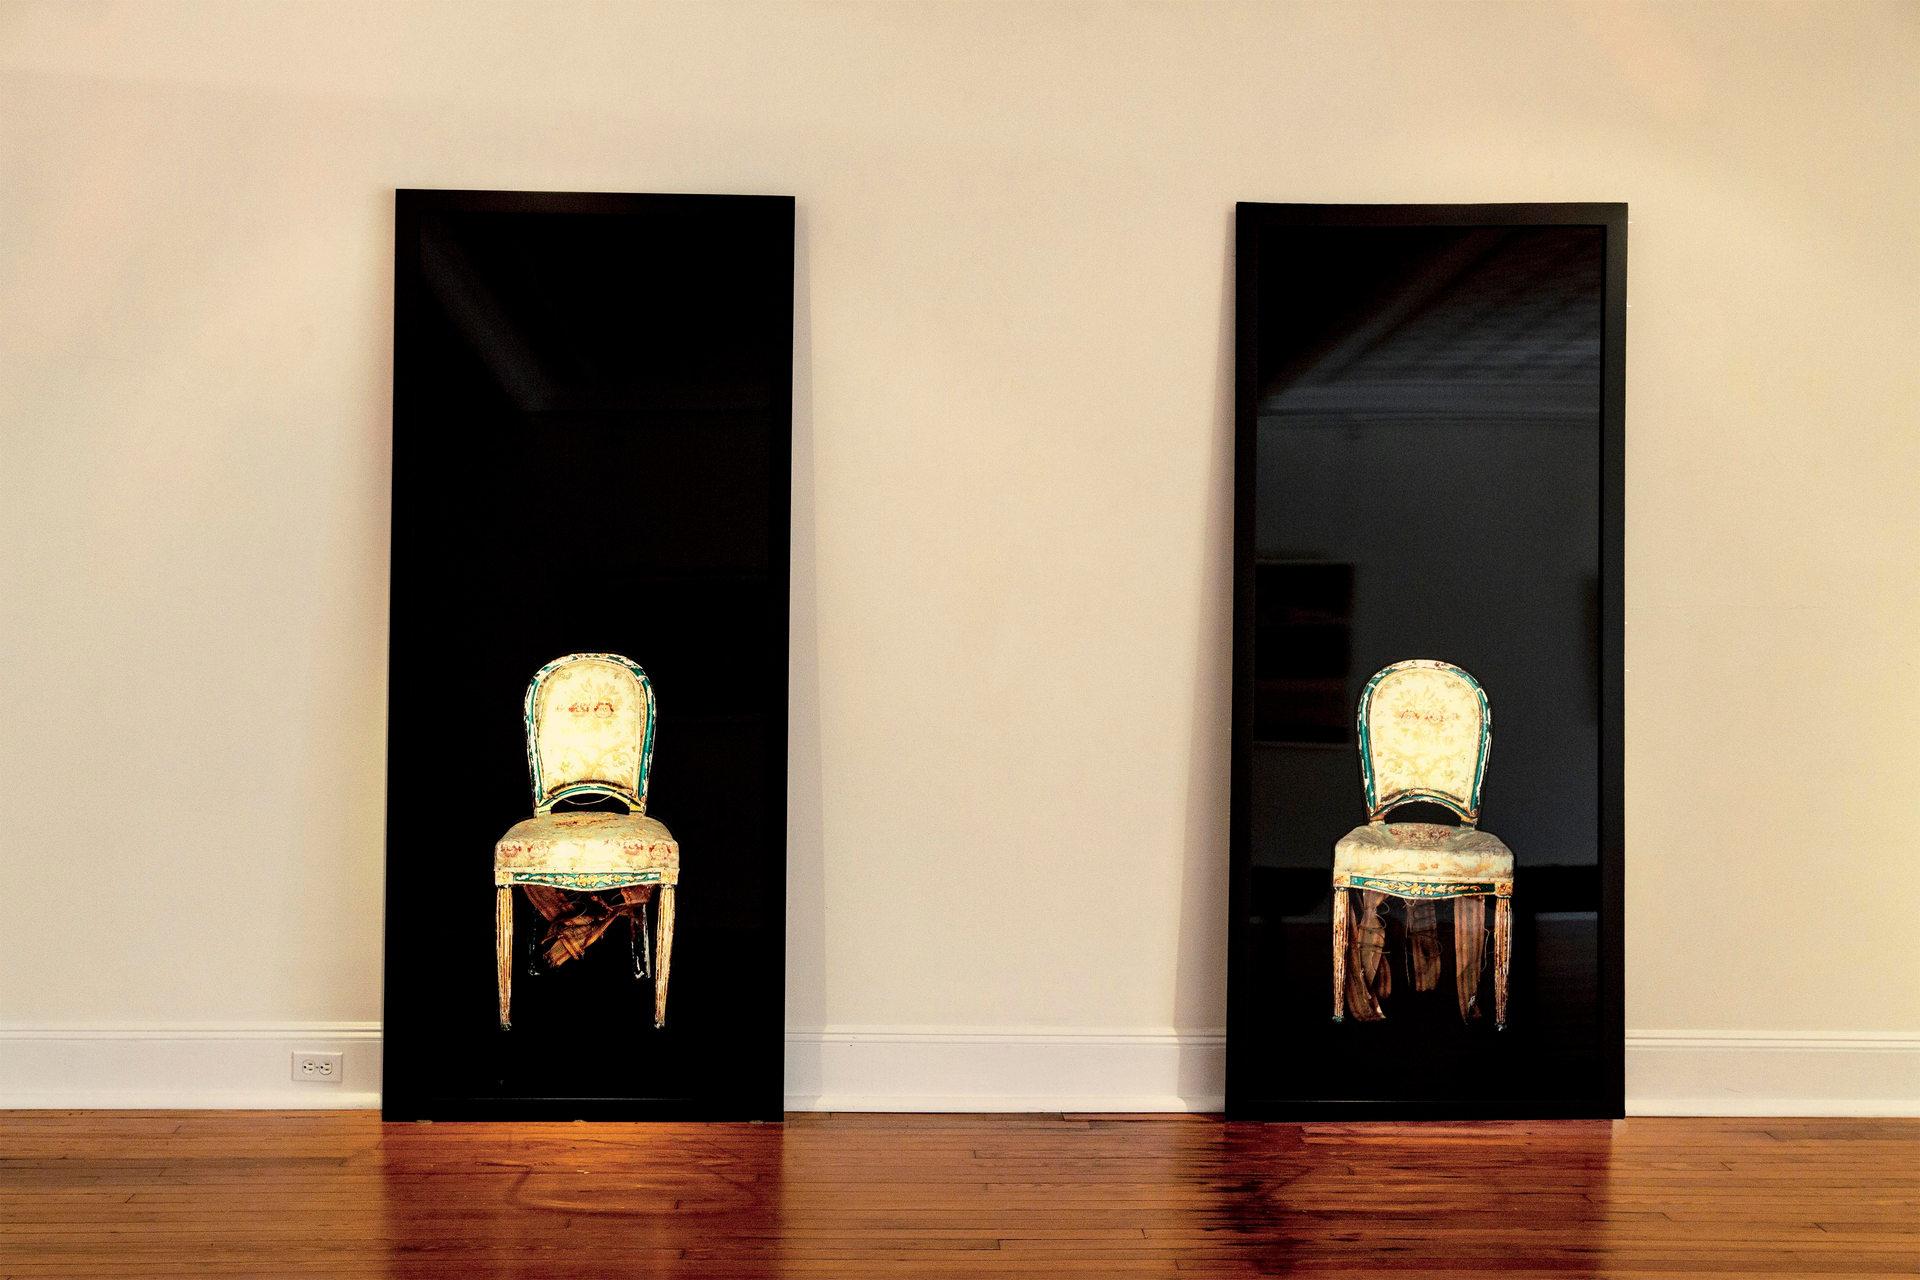 4.Ret Chair Pair Installation Exp Xtr G7